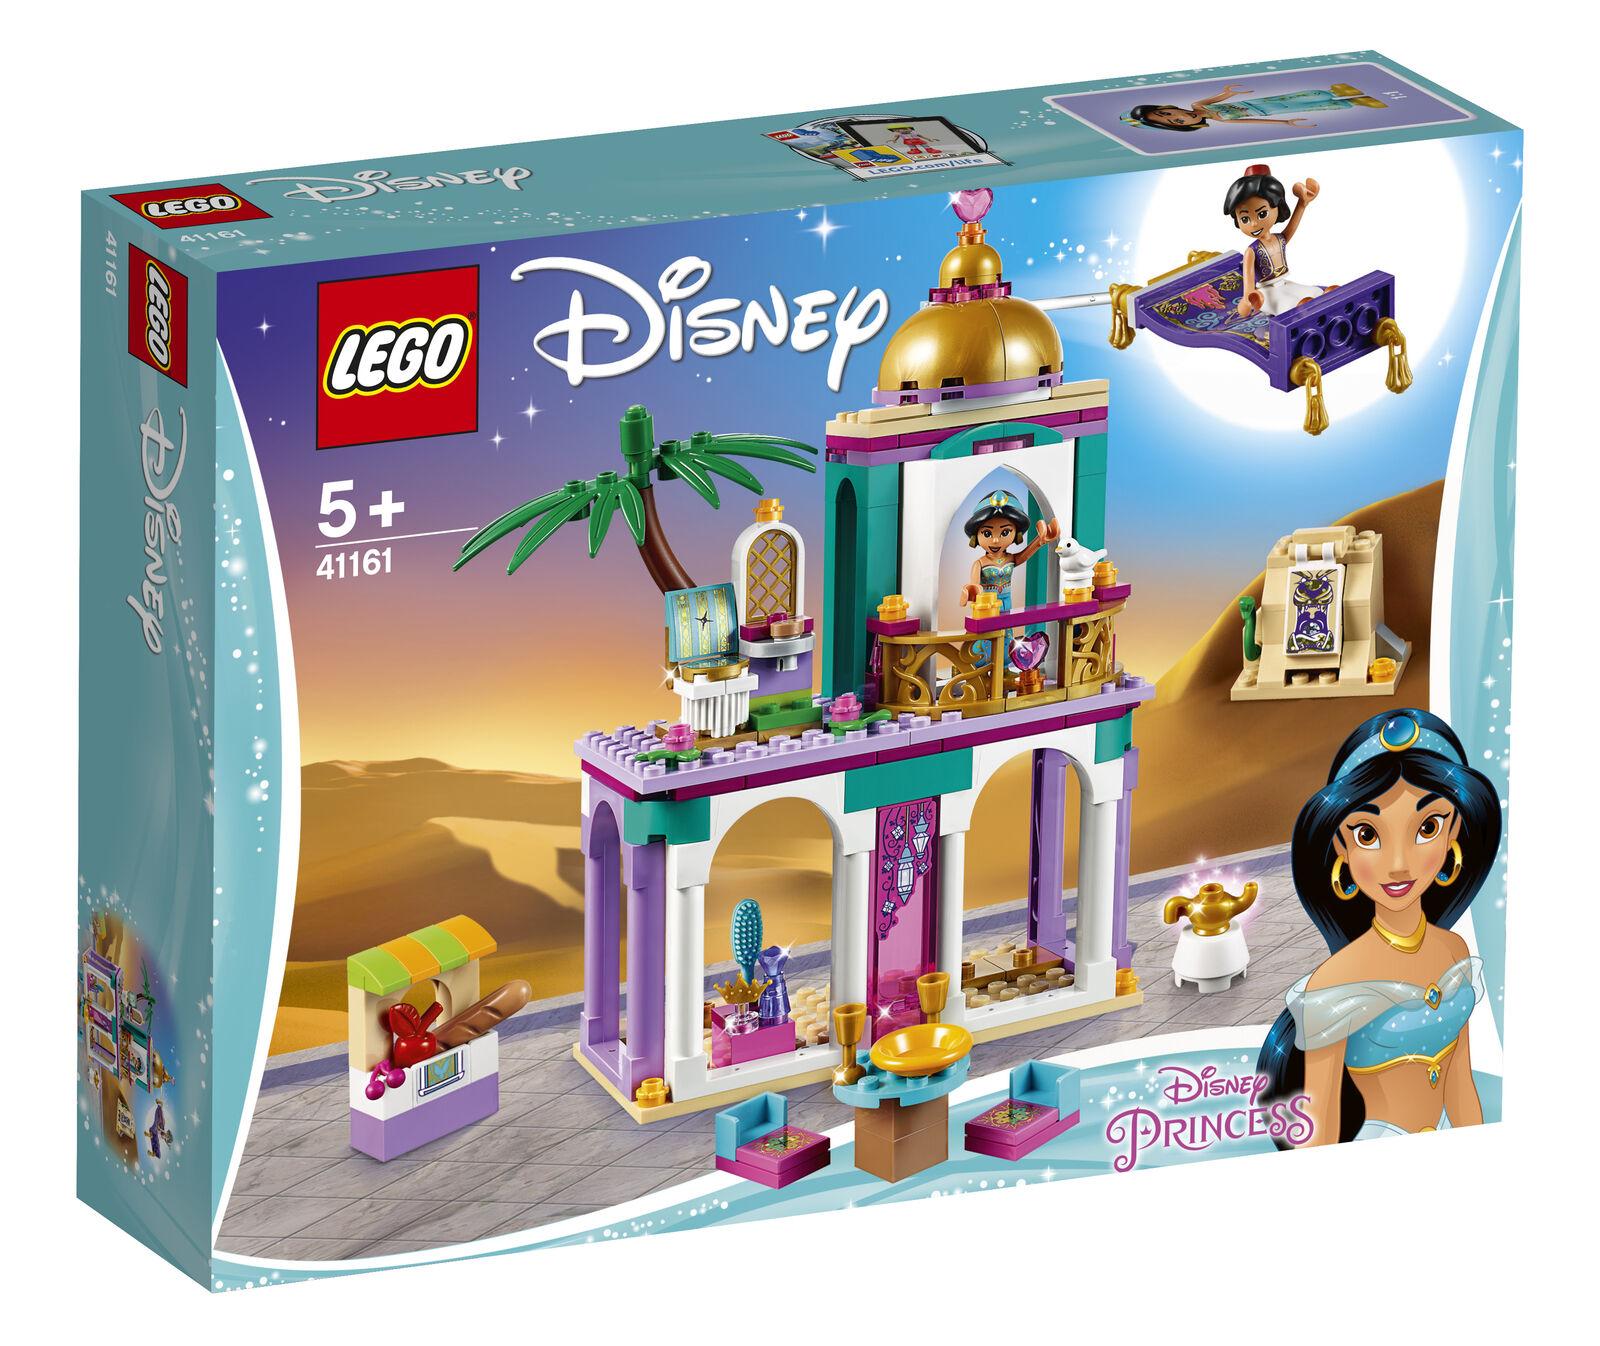 LEGO Aladdin and Jasmine's Palace Adventures Set (41161) (41161) (41161) 6445ca